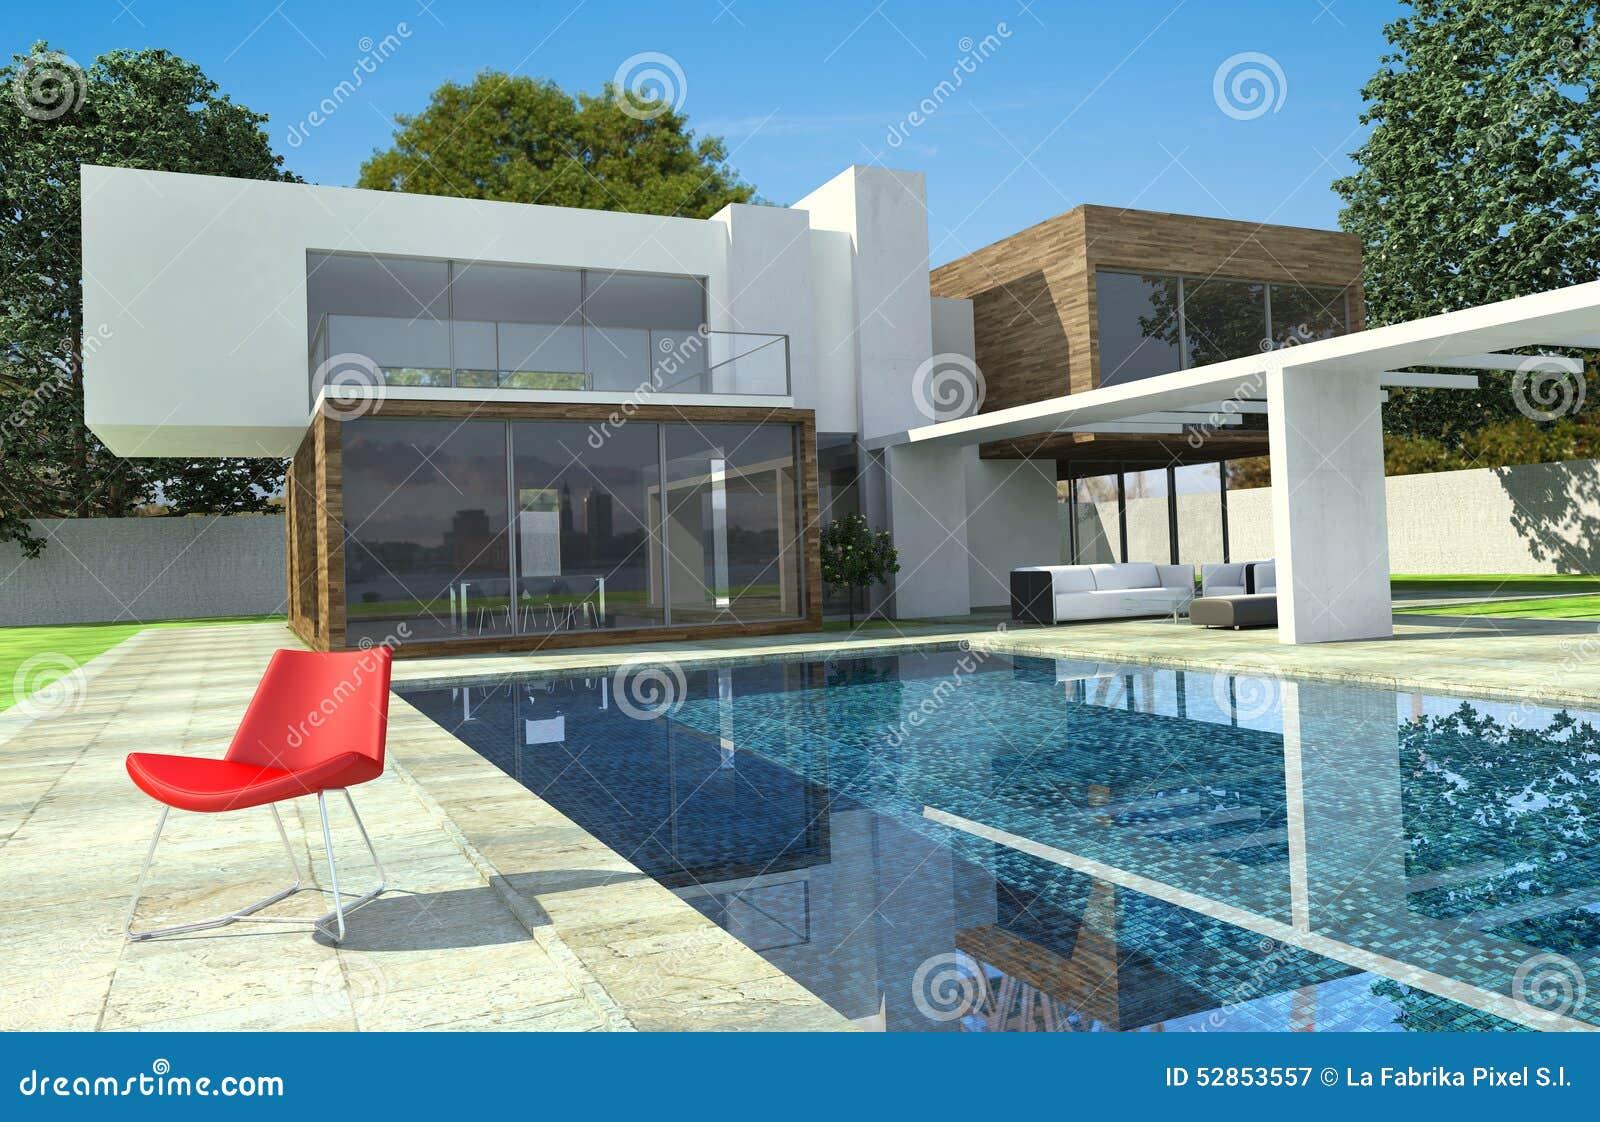 Modern Mansion Exterior luxury modern mansion exterior stock illustration - image: 52853557